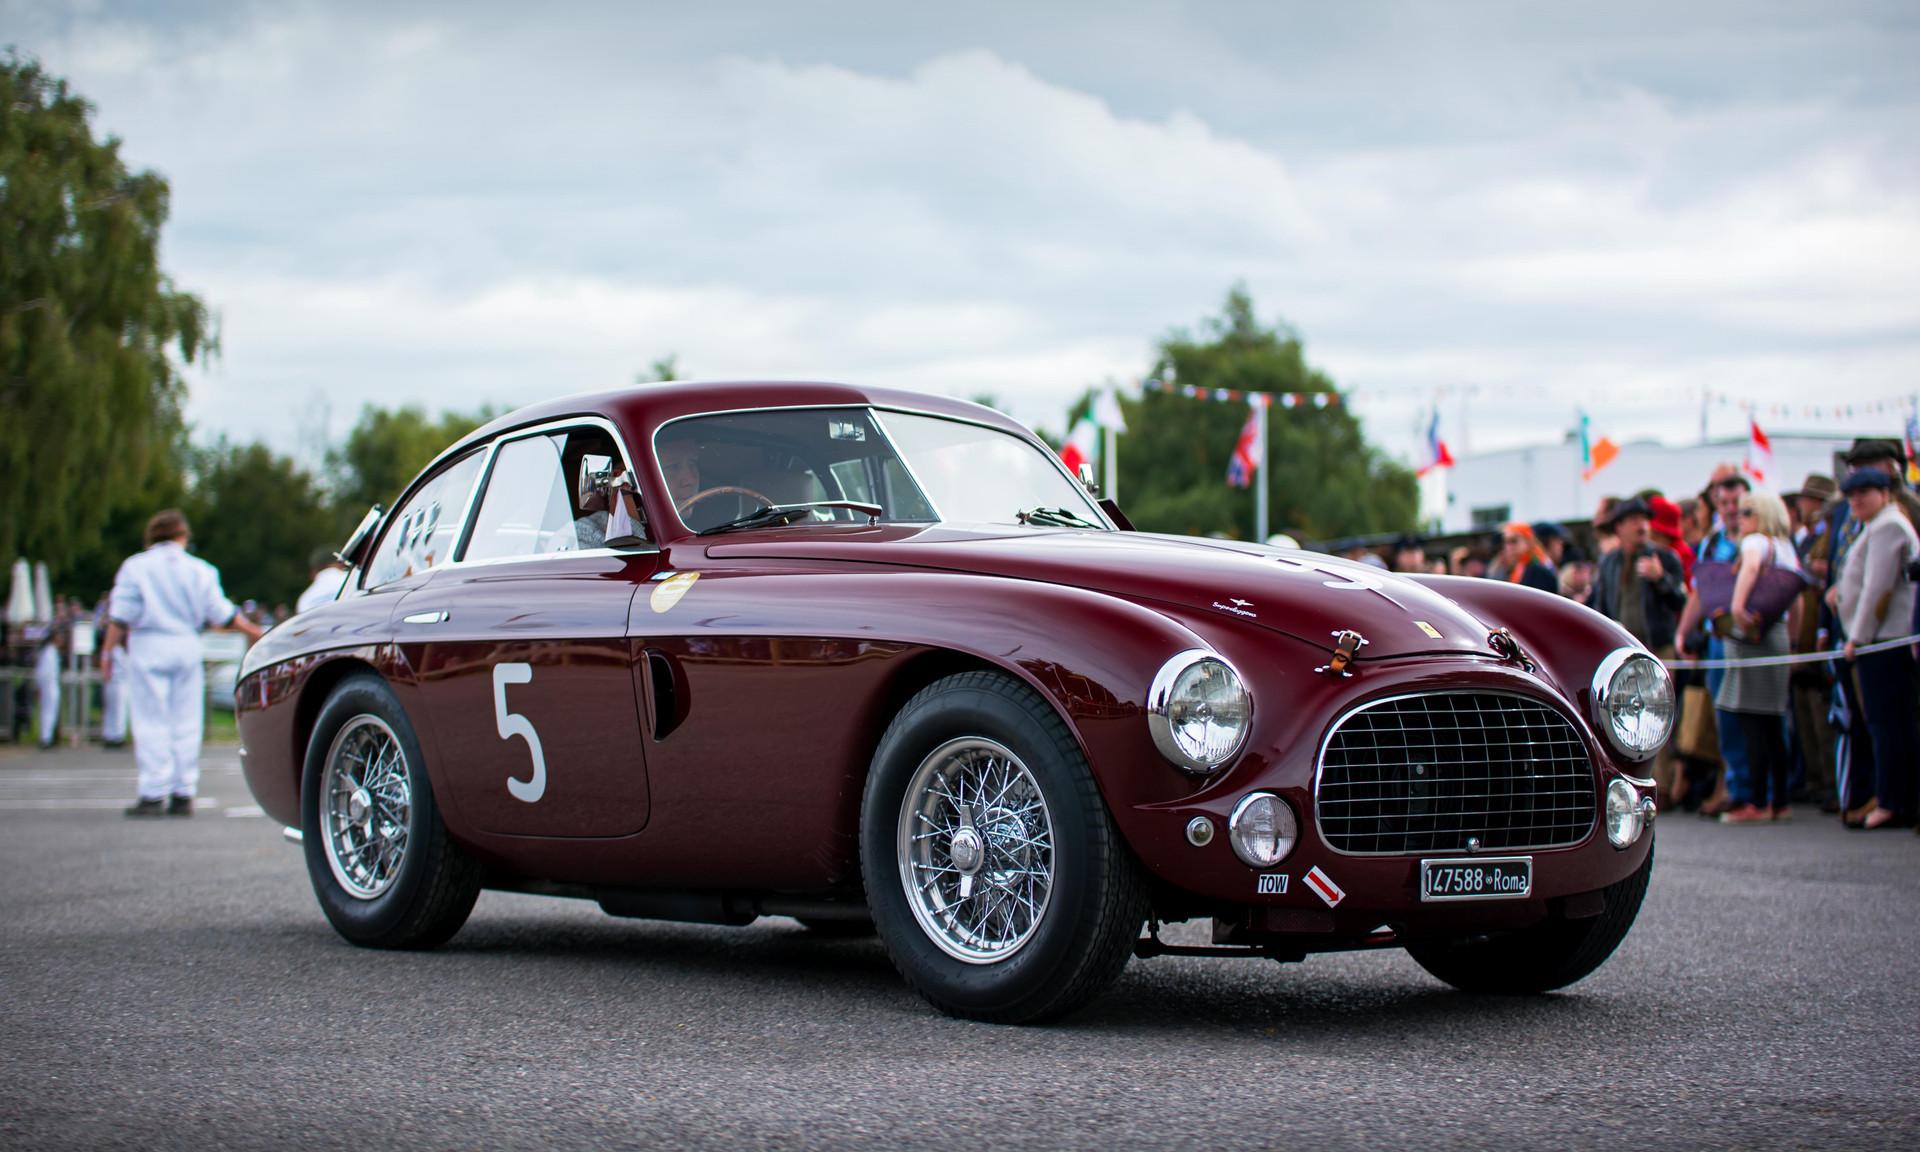 Martin Halusa's 1951 Ferrari 212 Export